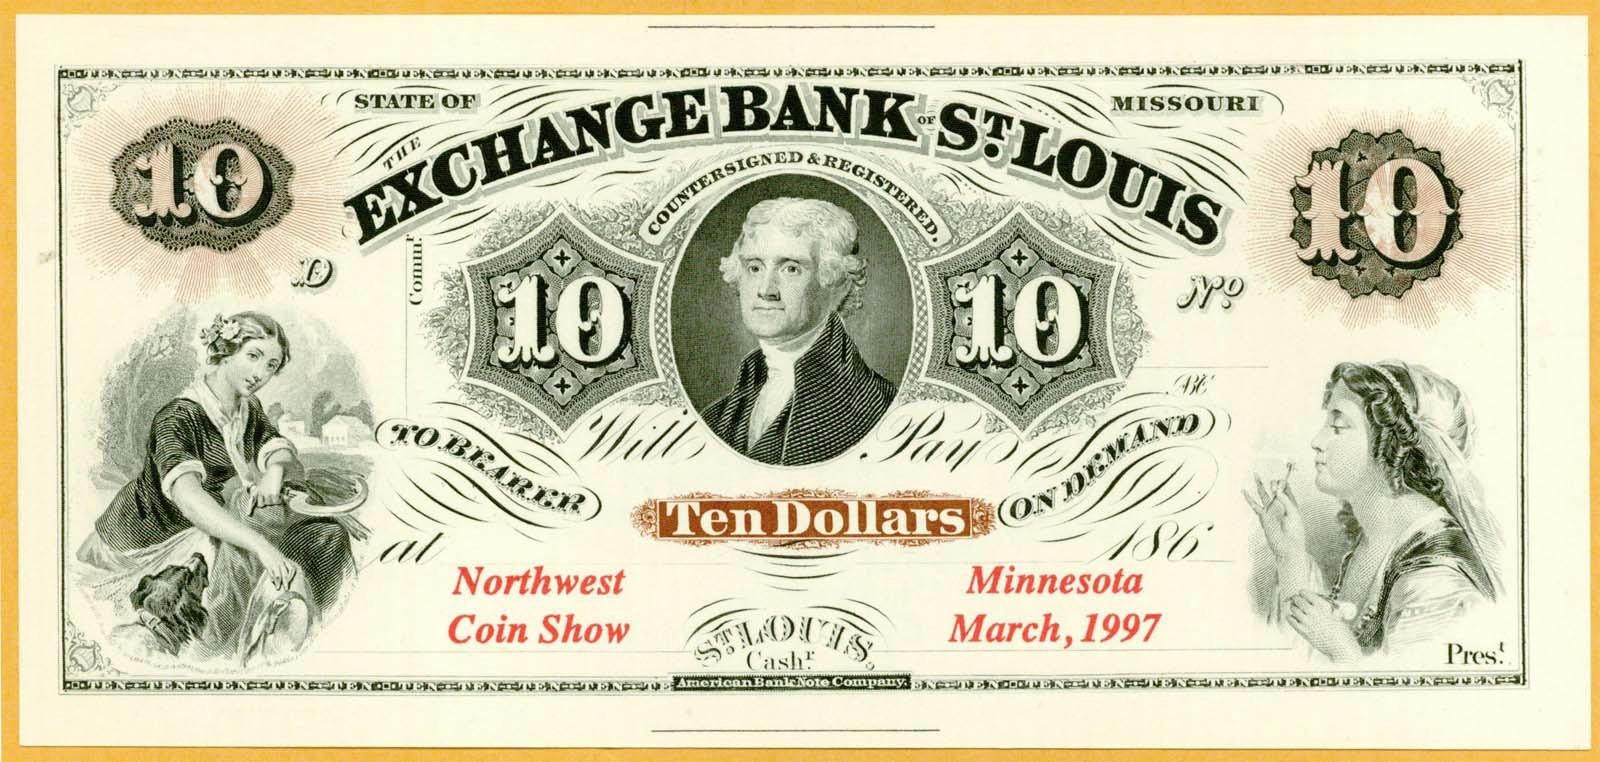 Minnesota 97 front.jpg